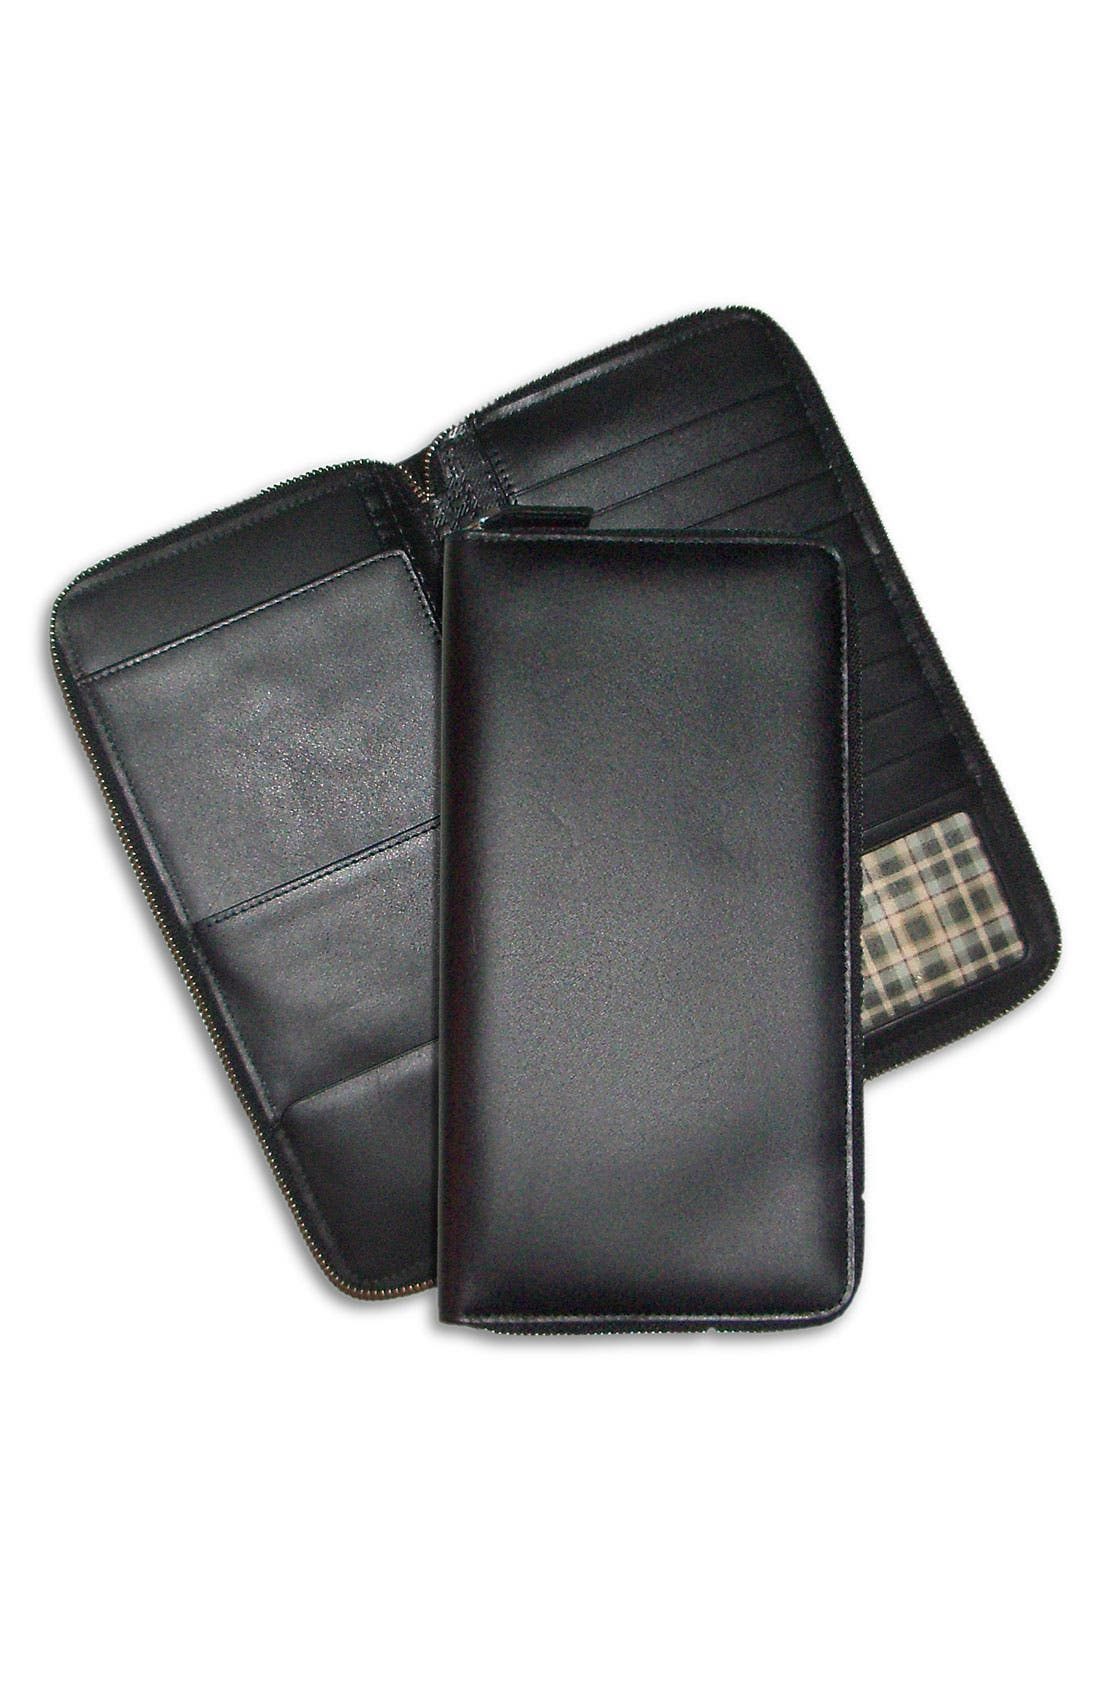 Alternate Image 1 Selected - Boconi Leather Traveler Wallet